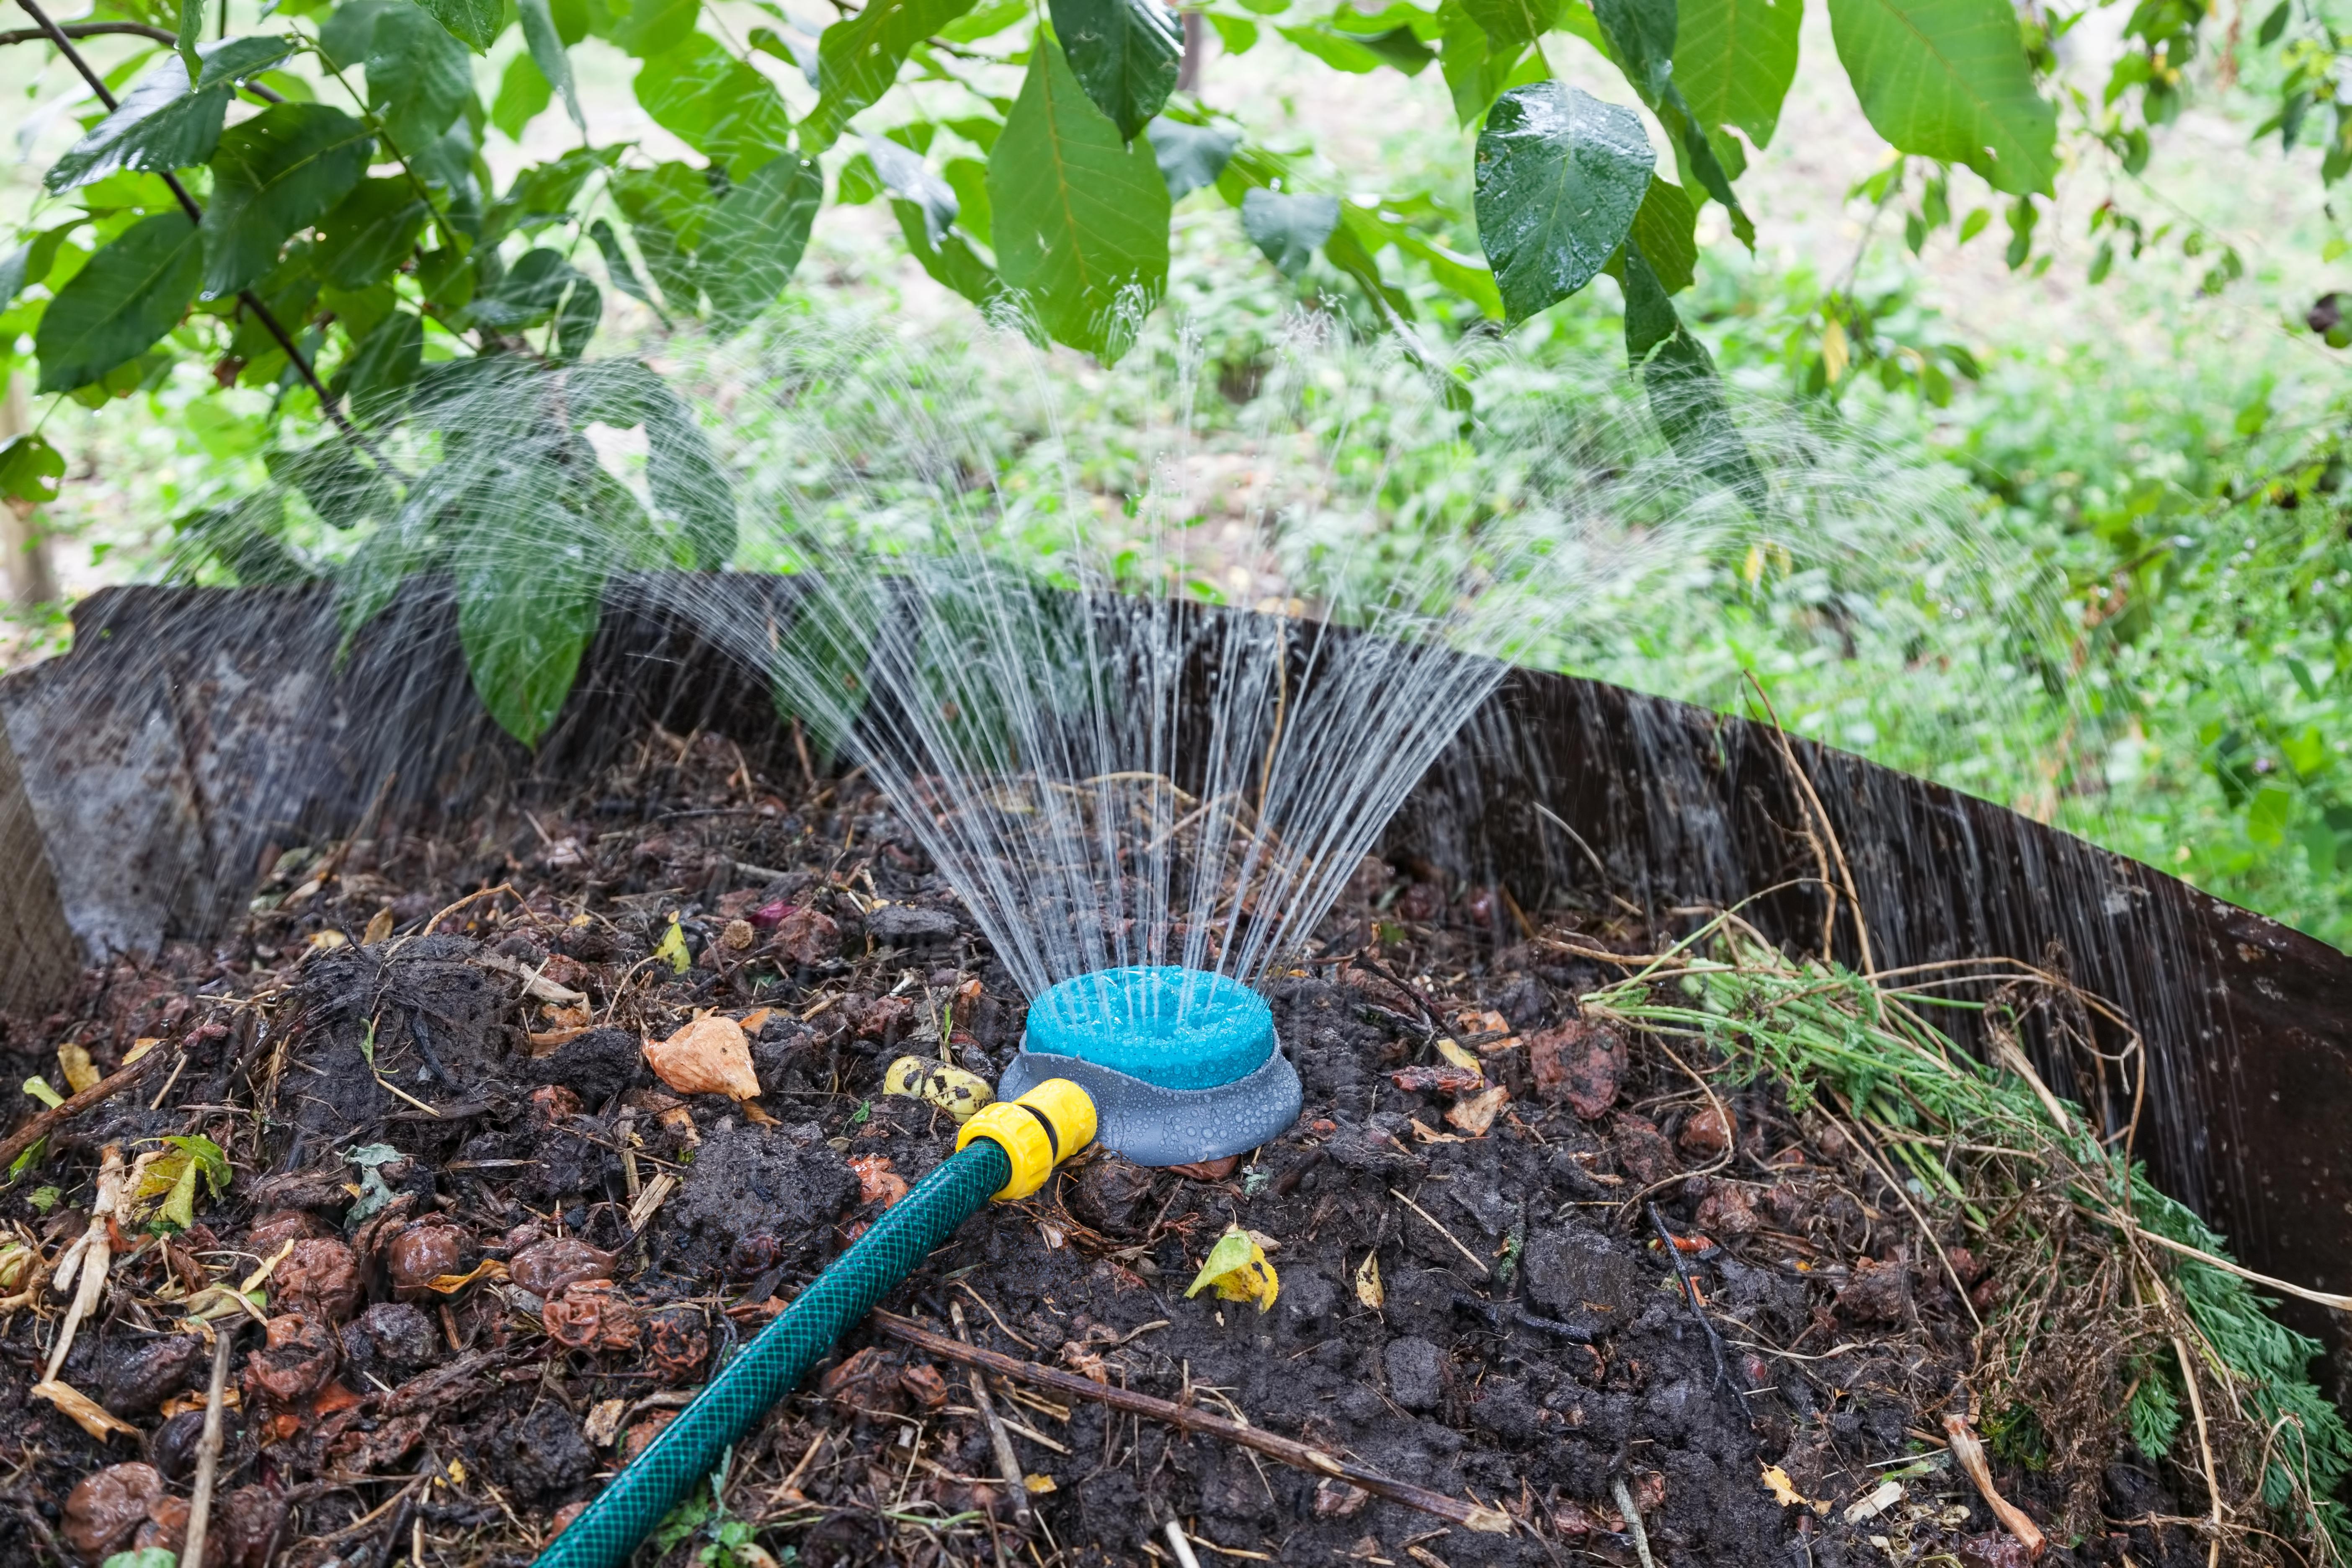 Watering garden soil